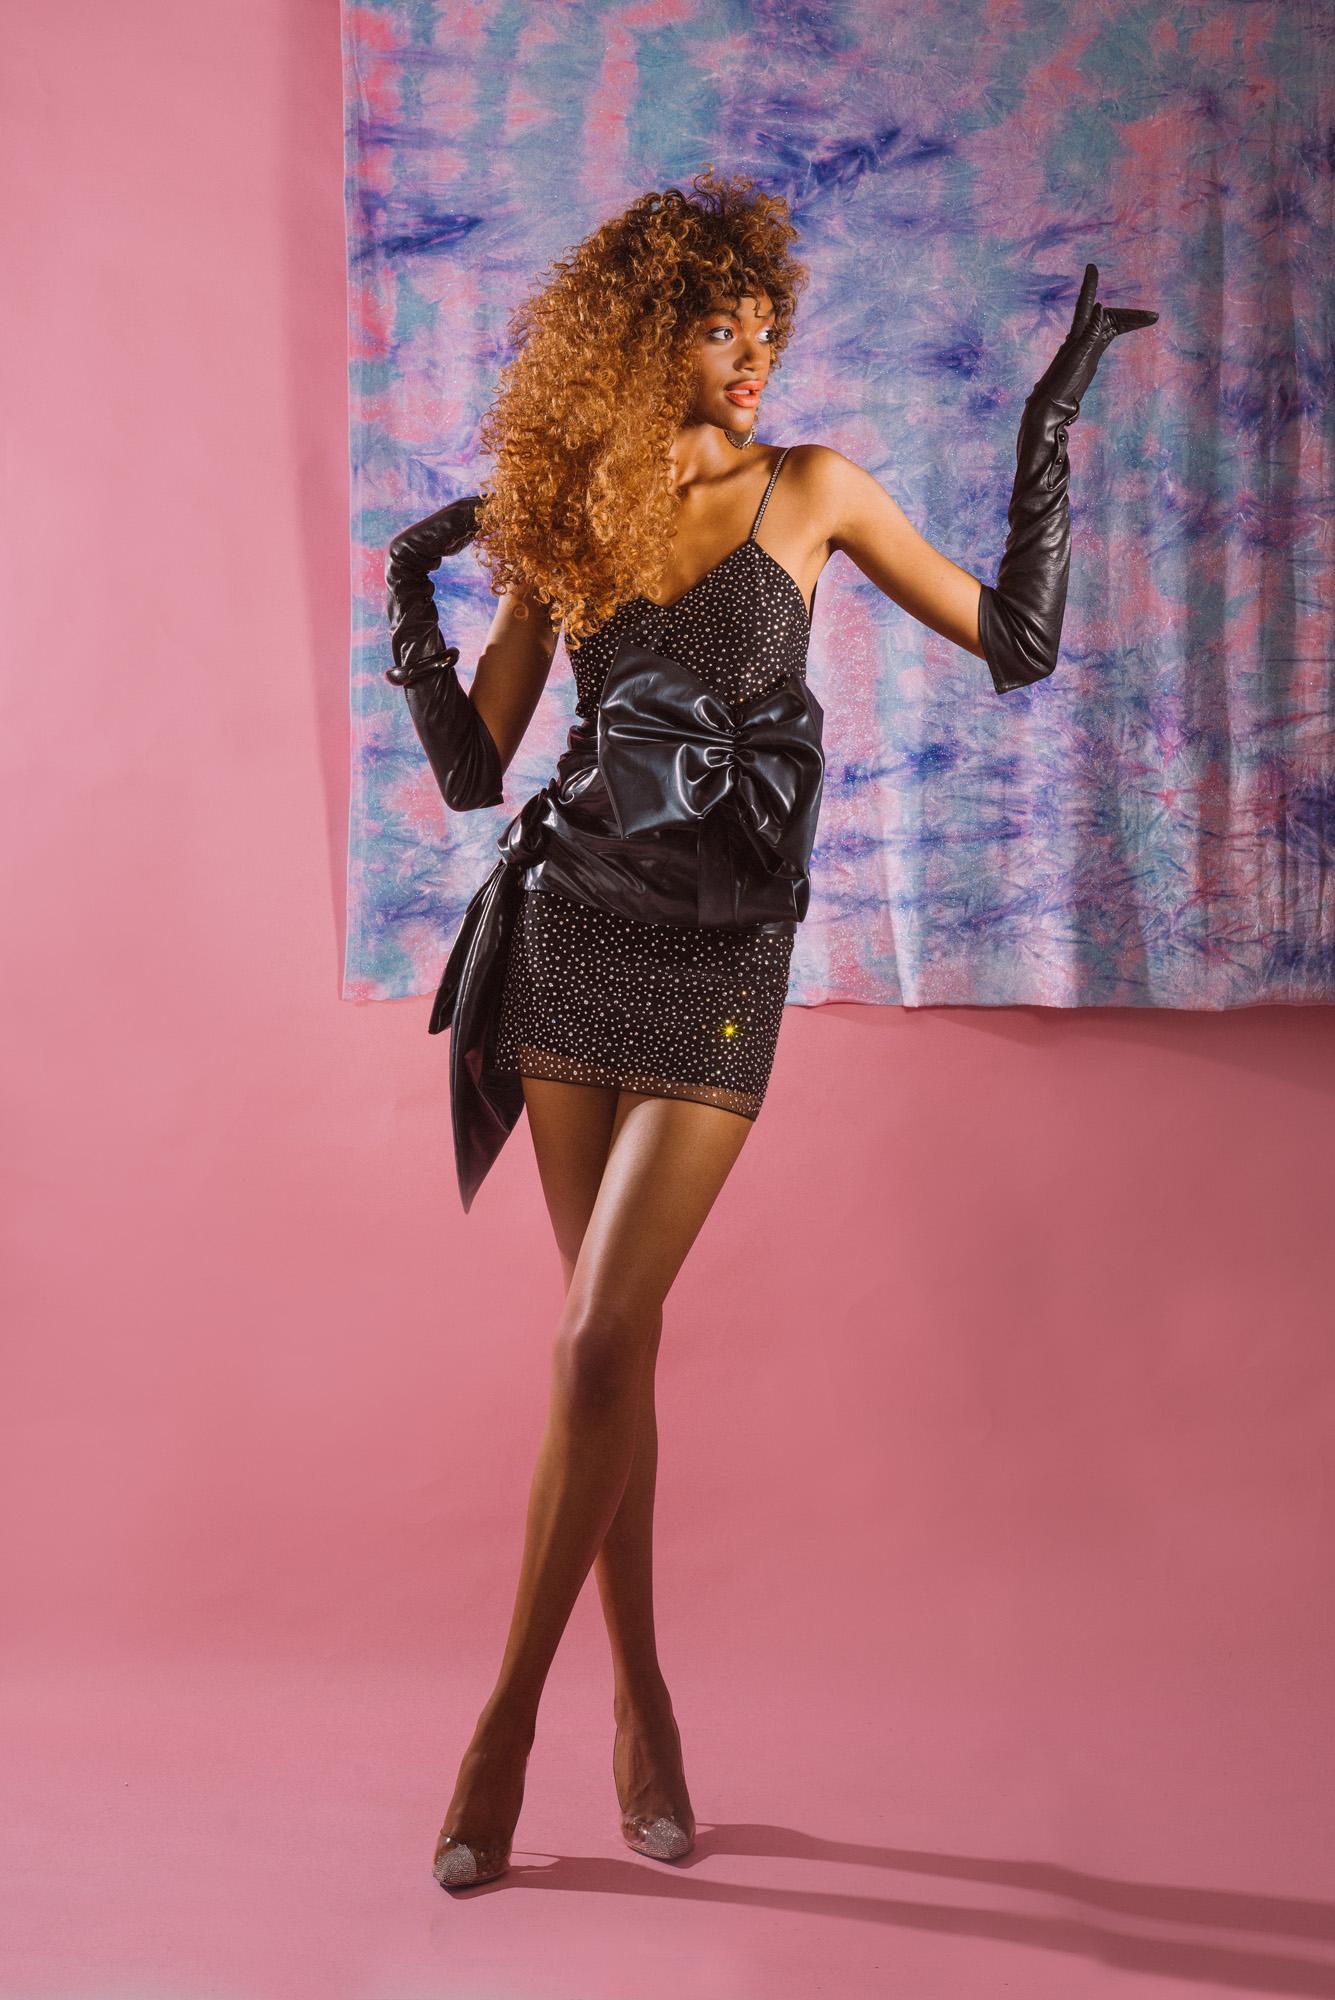 Whitney-2141.jpg